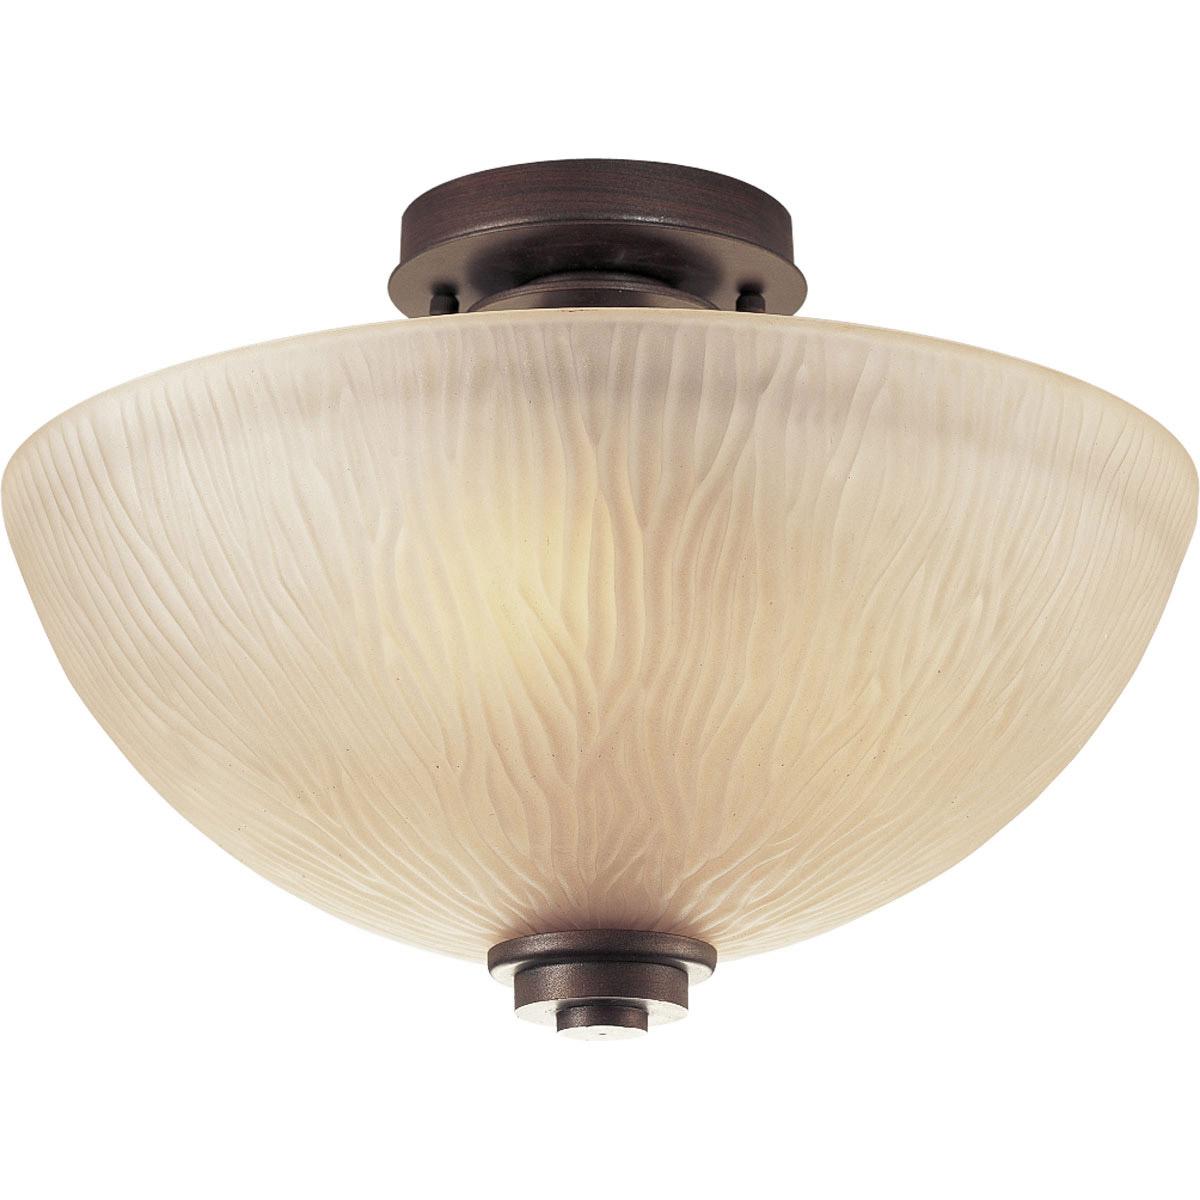 home ceiling lighting close to ceiling light fixtures semi flu. Black Bedroom Furniture Sets. Home Design Ideas